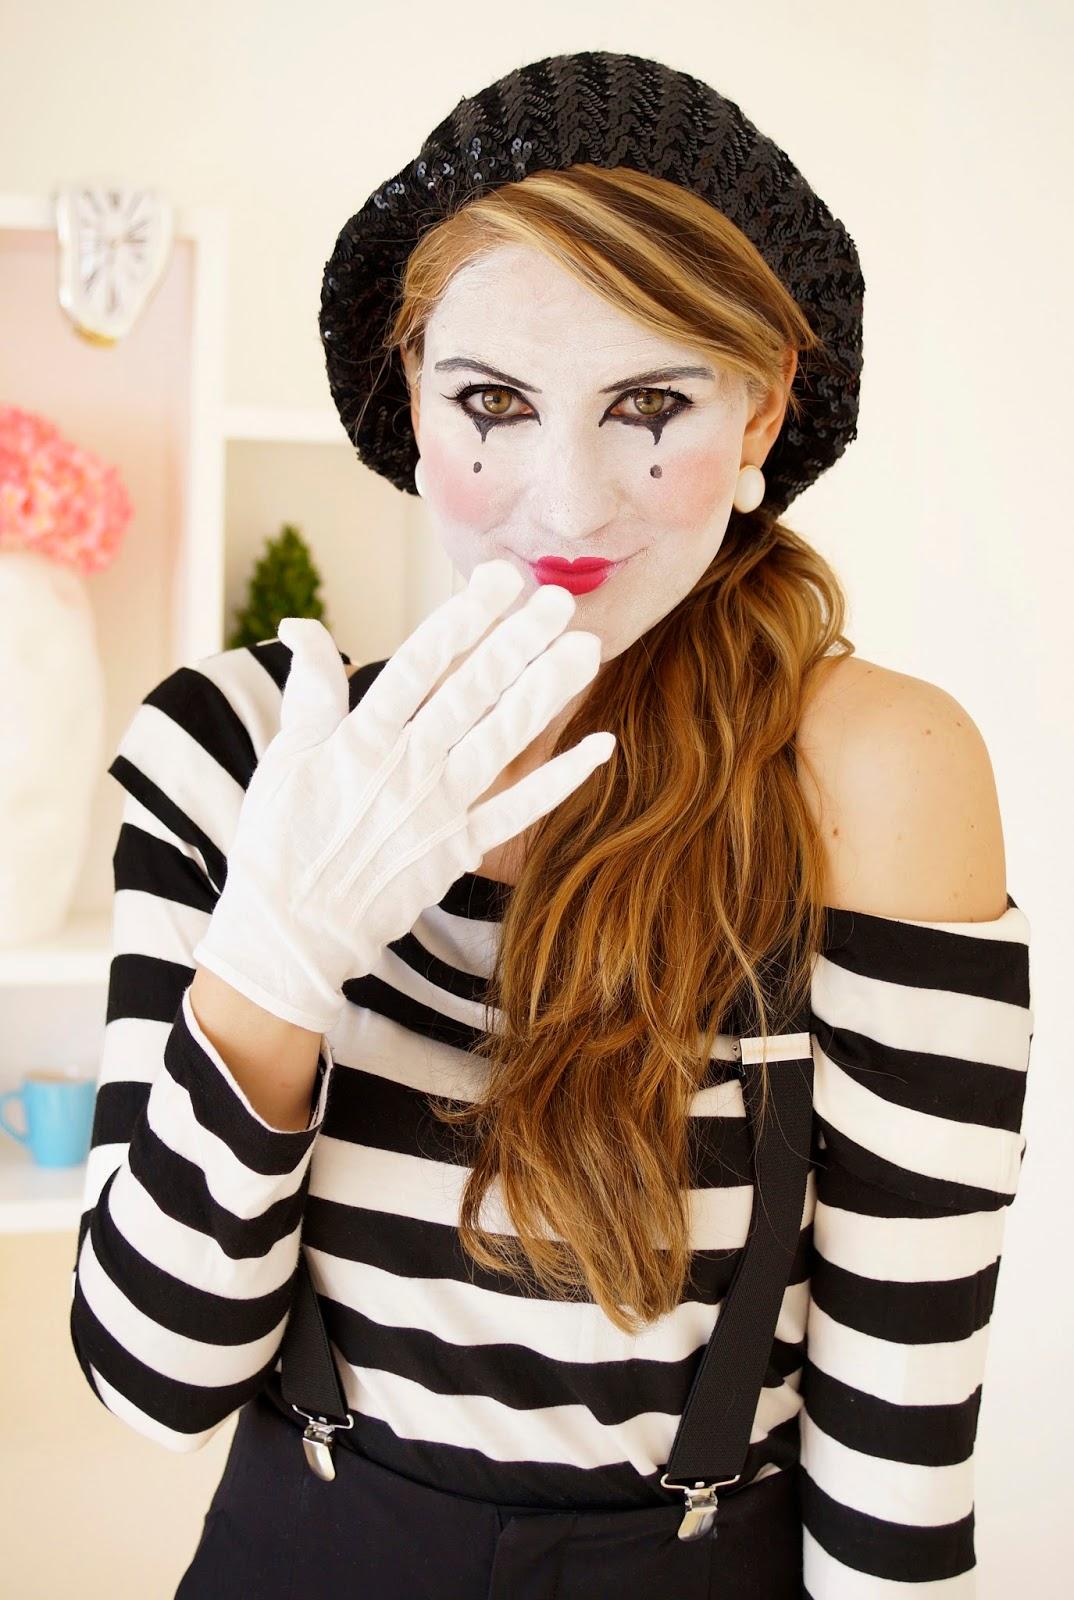 Easy Homemade Costume & The Joy of Fashion: Halloween: Last Minute Homemade Mime Costume